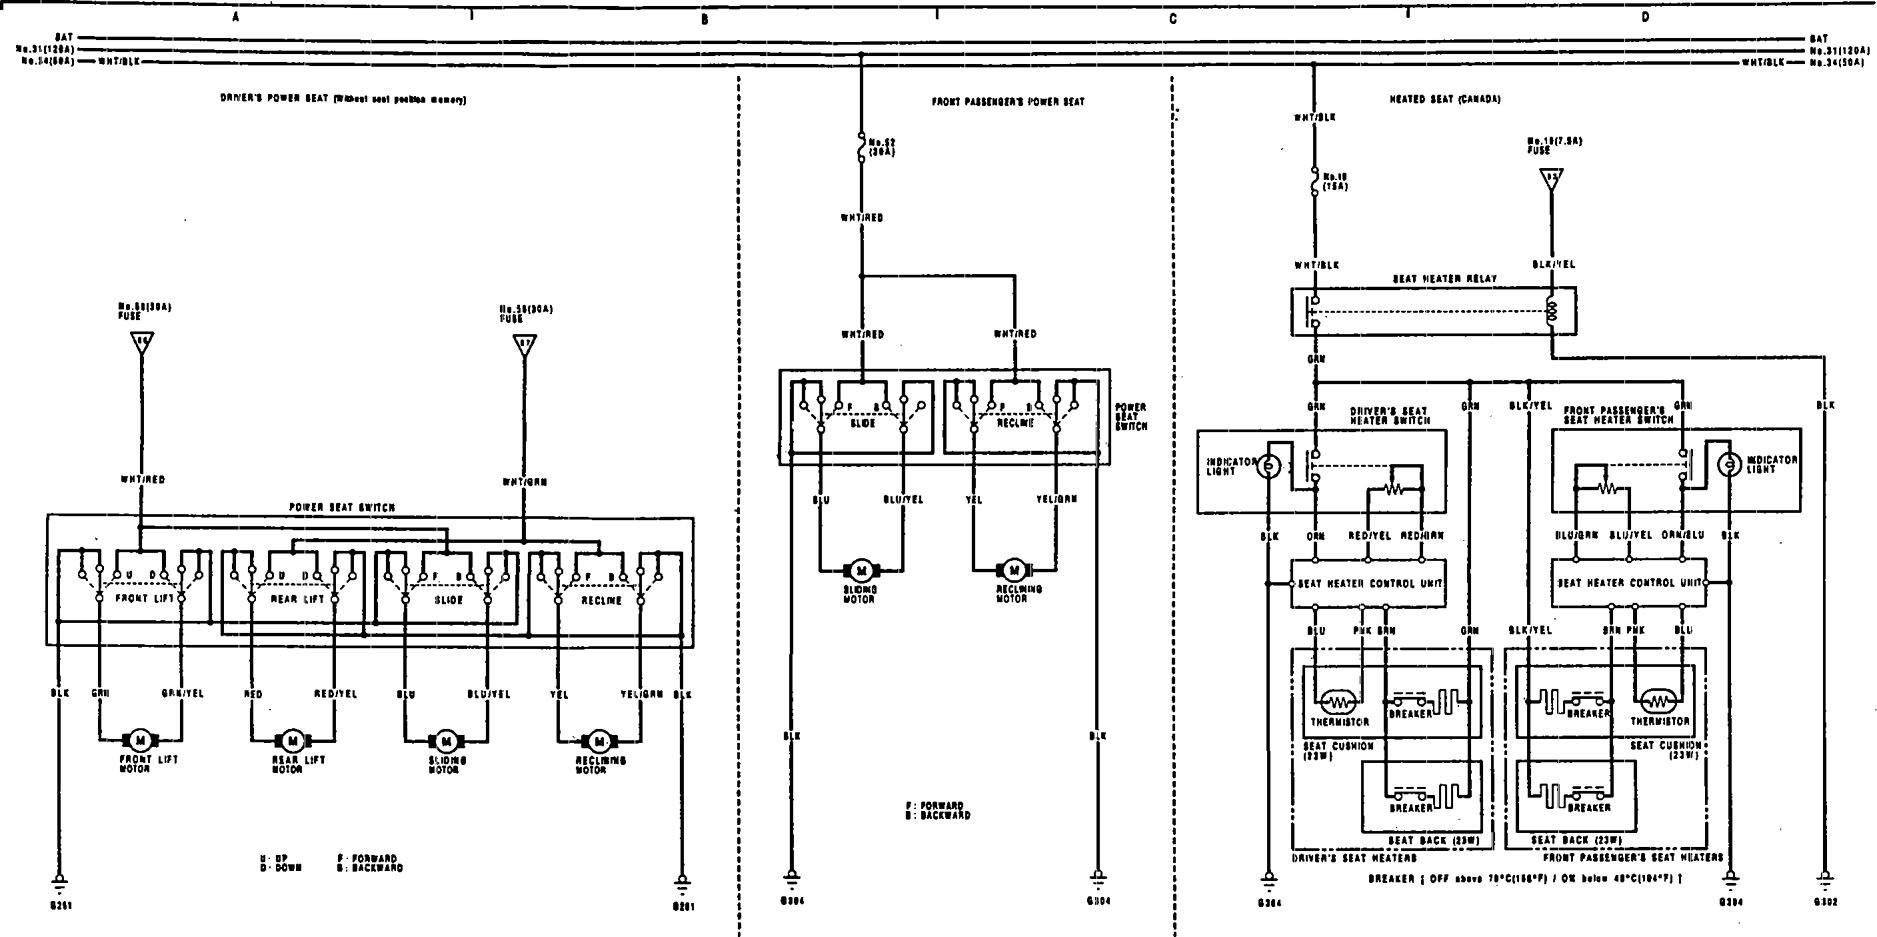 Acura Legend – wiring diagram – power seat